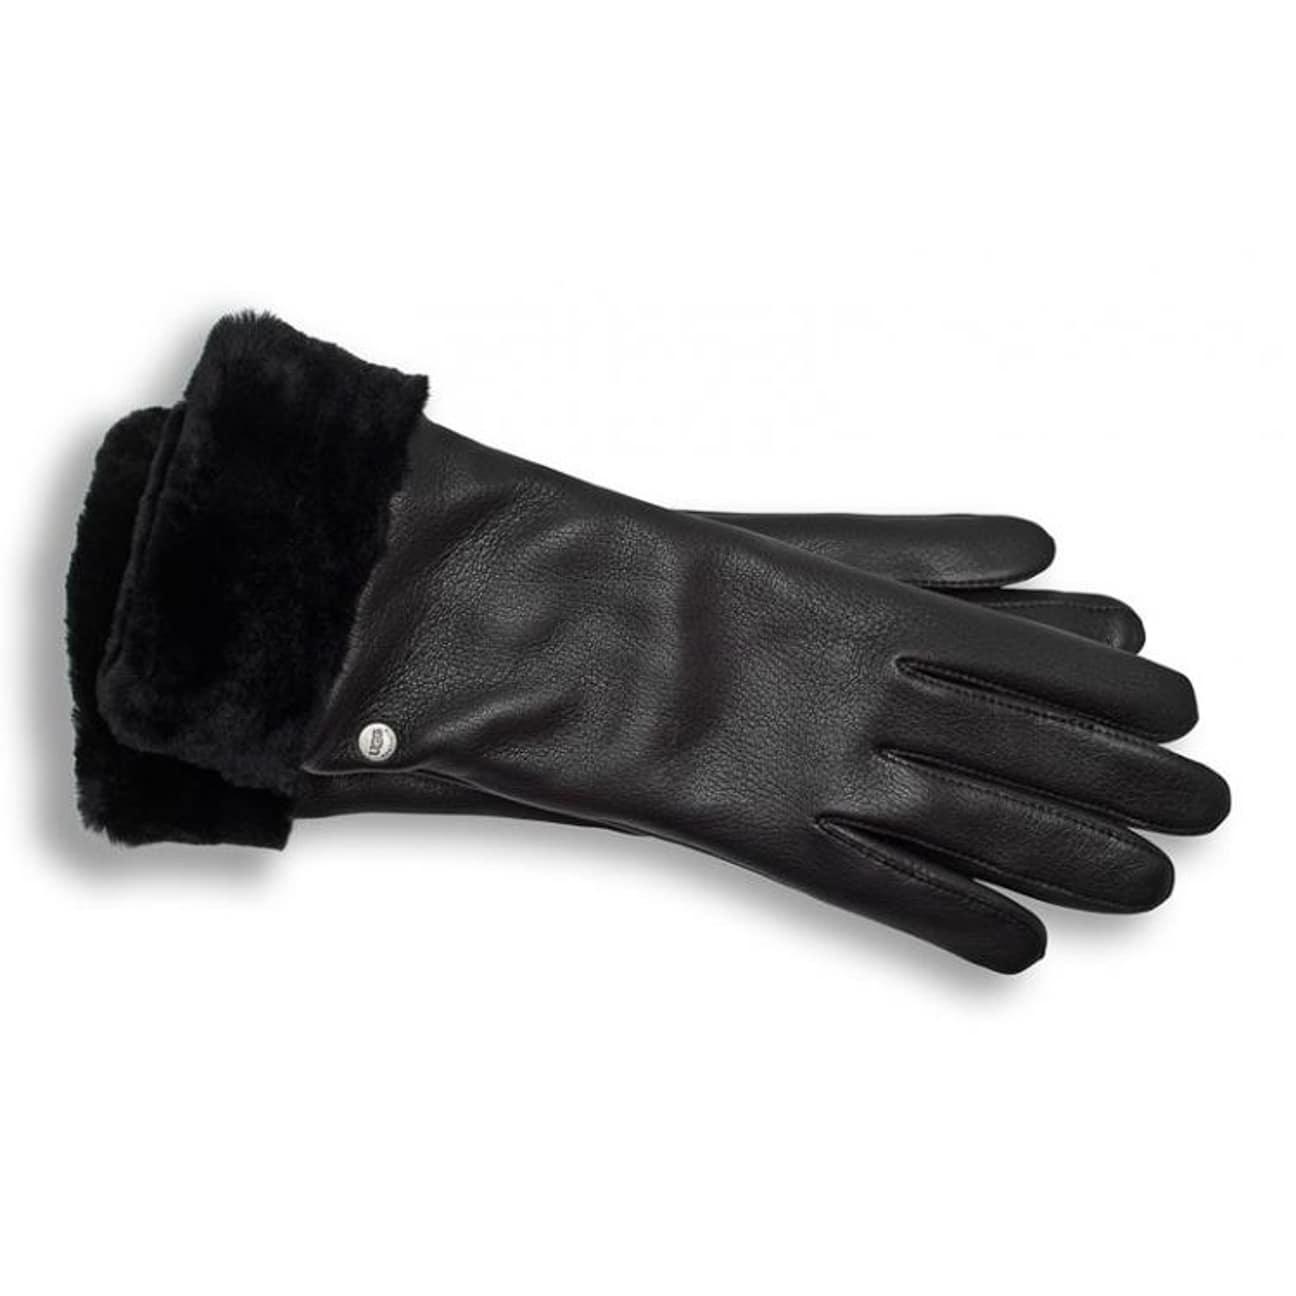 guanti donna ugg